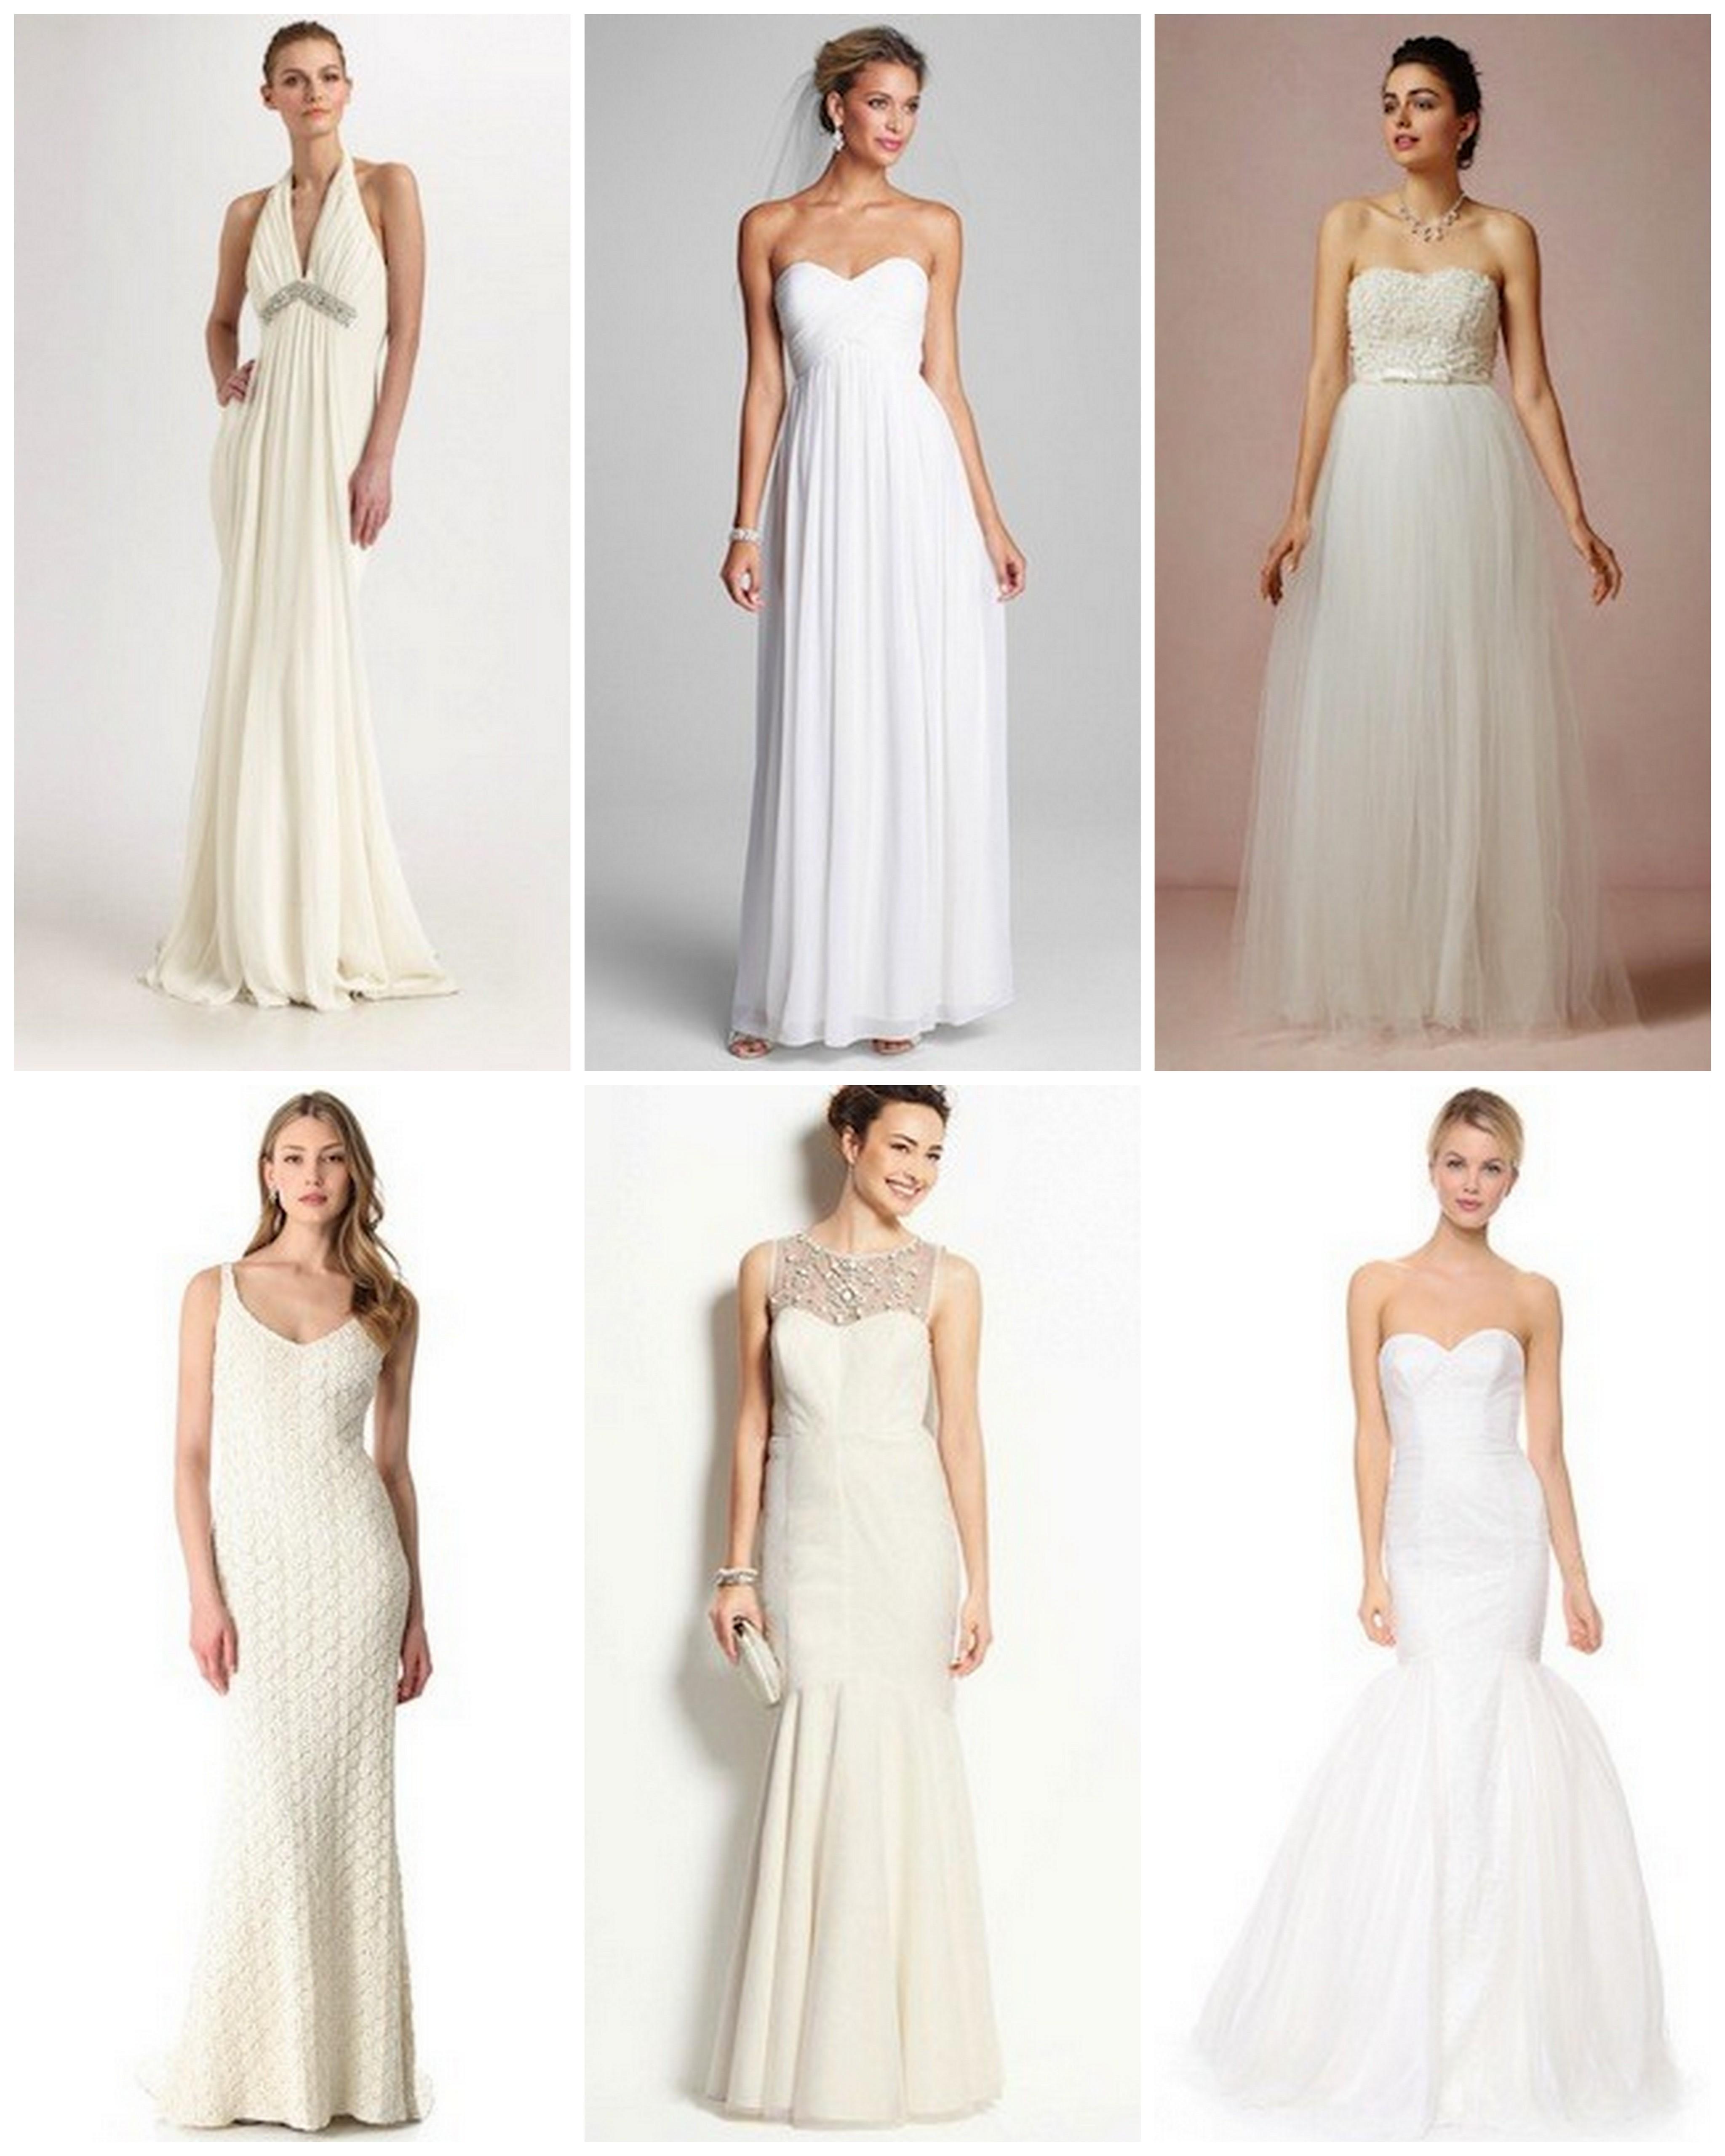 perfect dresses for any body type - Dream Irish Wedding